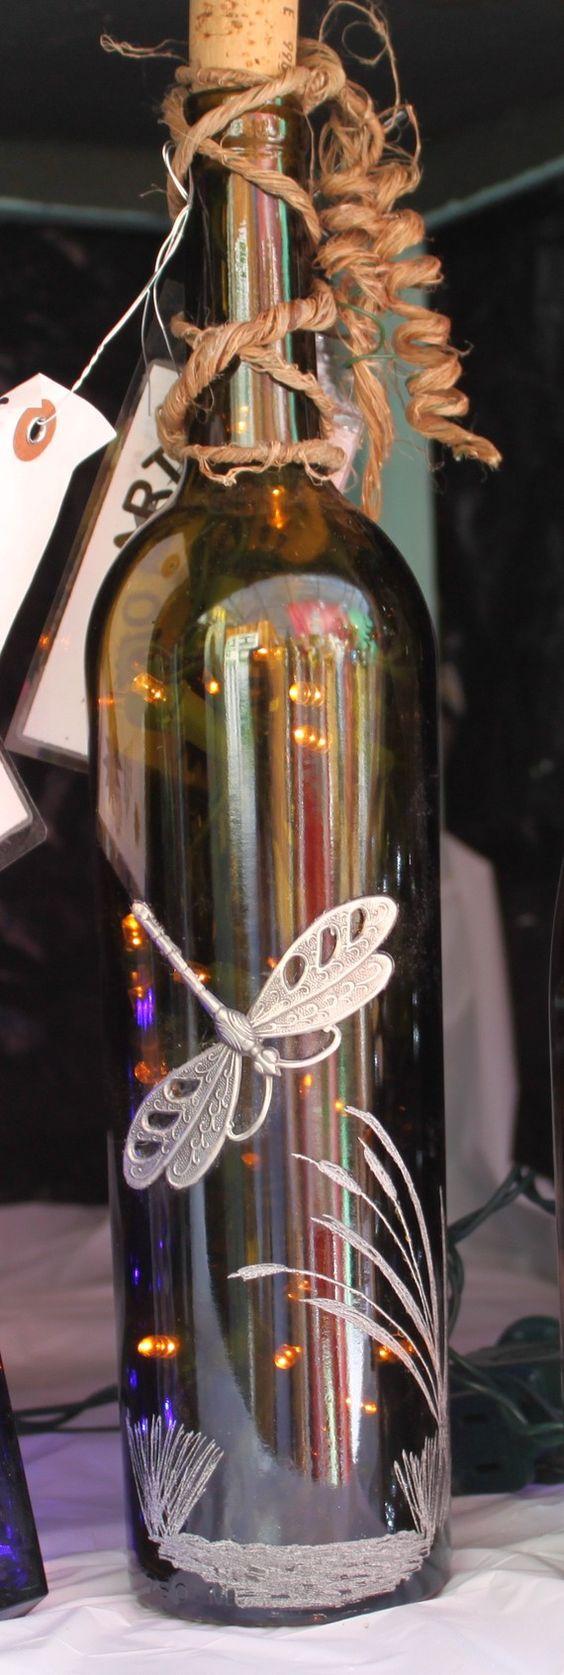 Wine bottle led dragonfly night light decrorative for Lighted wine bottle craft